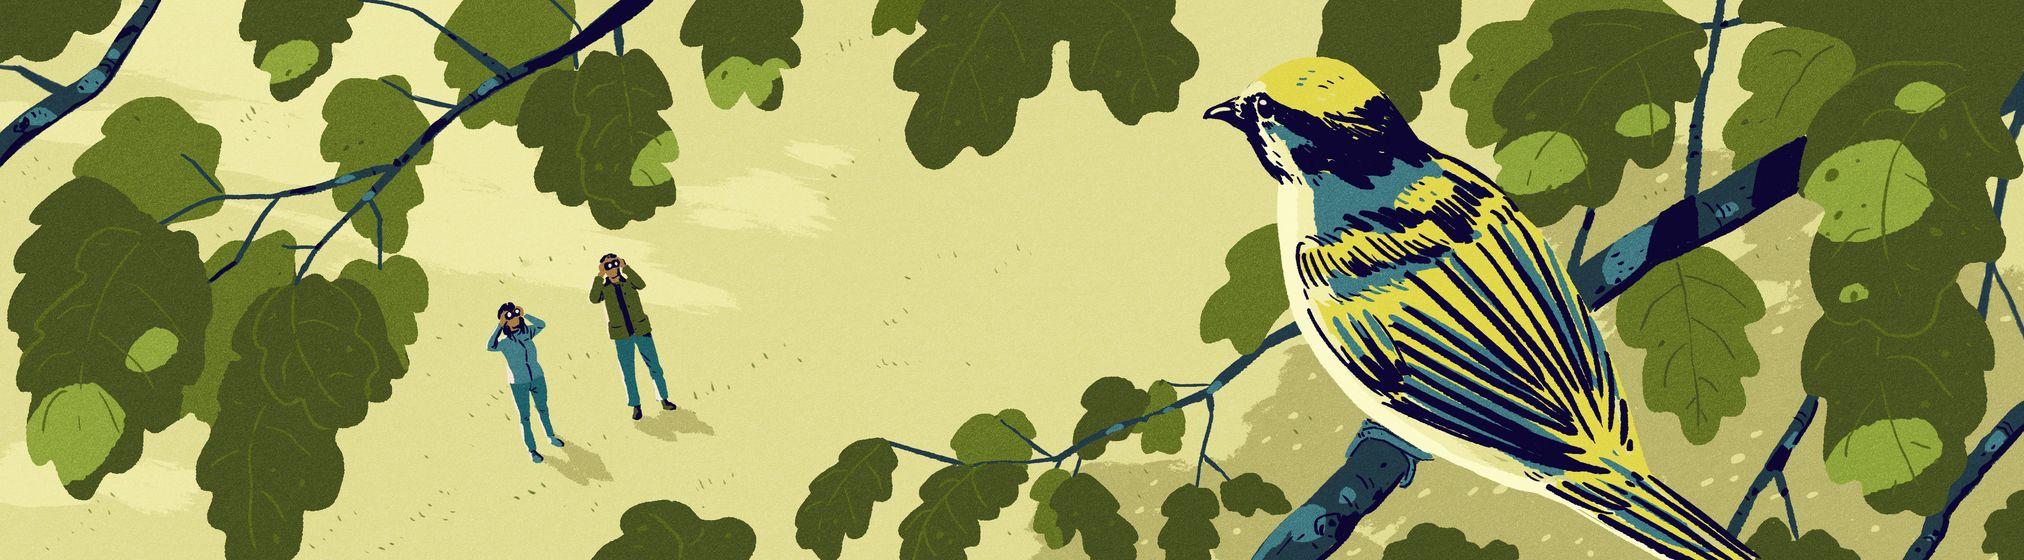 garance-illustration-jack-richardson-The-Boston-Globe-Bird-Watching